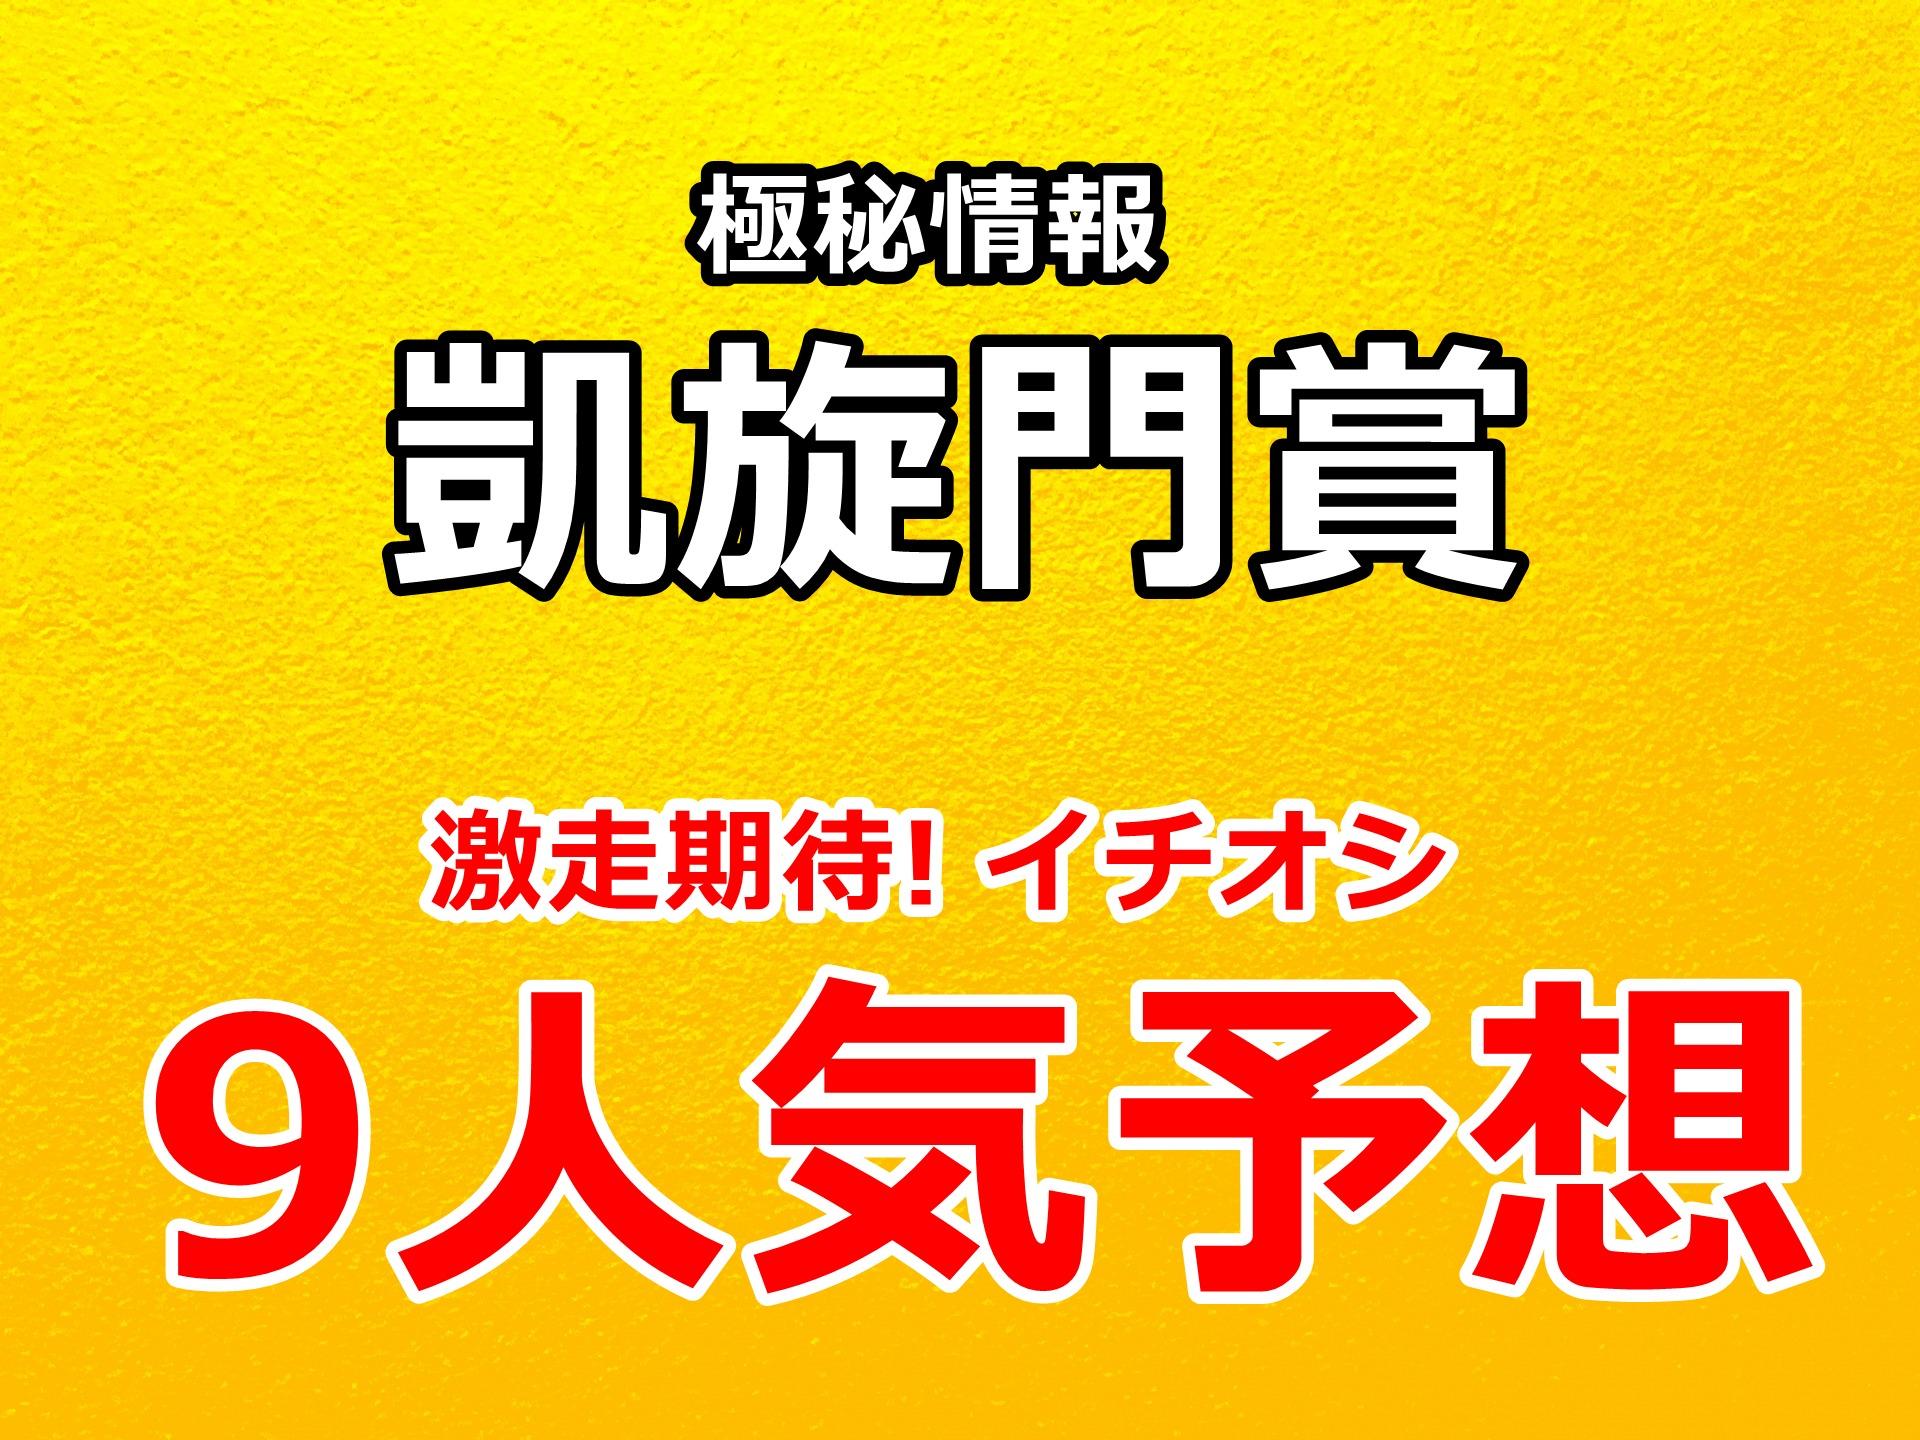 凱旋門賞2020 予想 【激走期待 イチオシ 9人気予想】